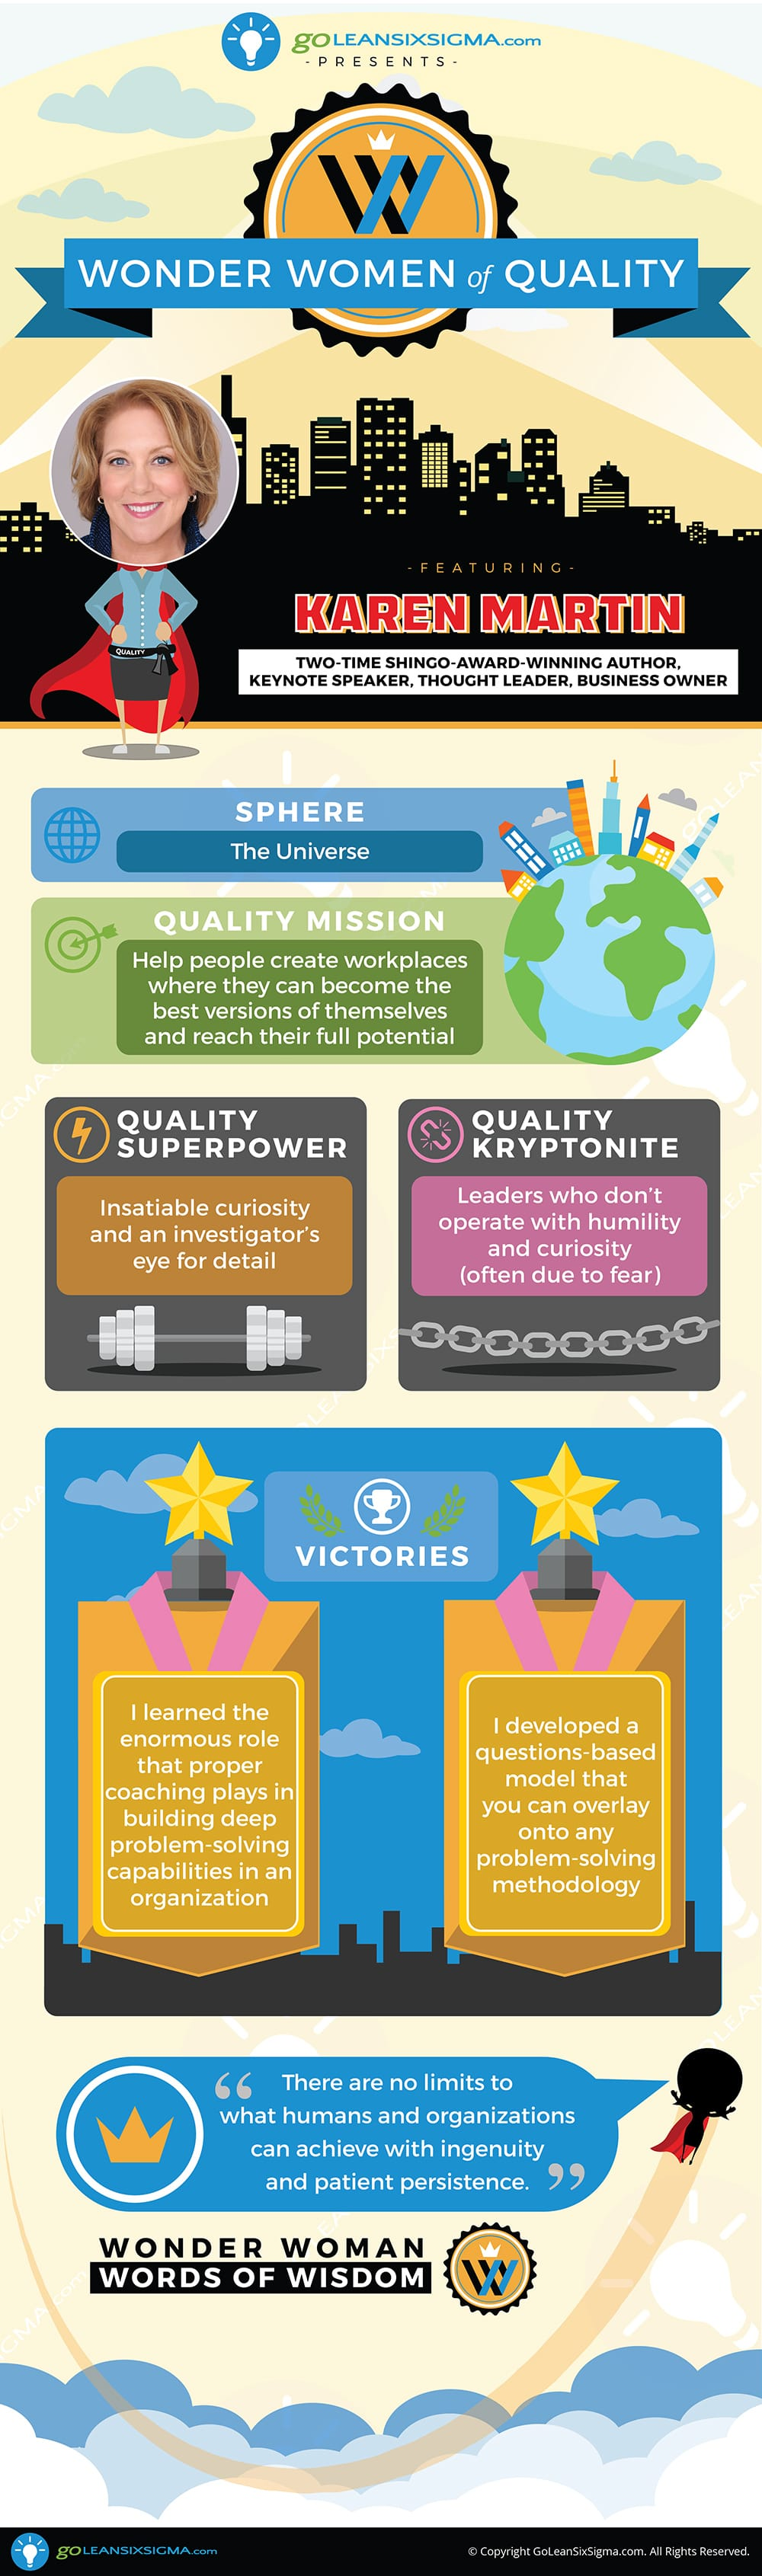 Wonder Women of Quality: Karen Martin - GoLeanSixSigma.com